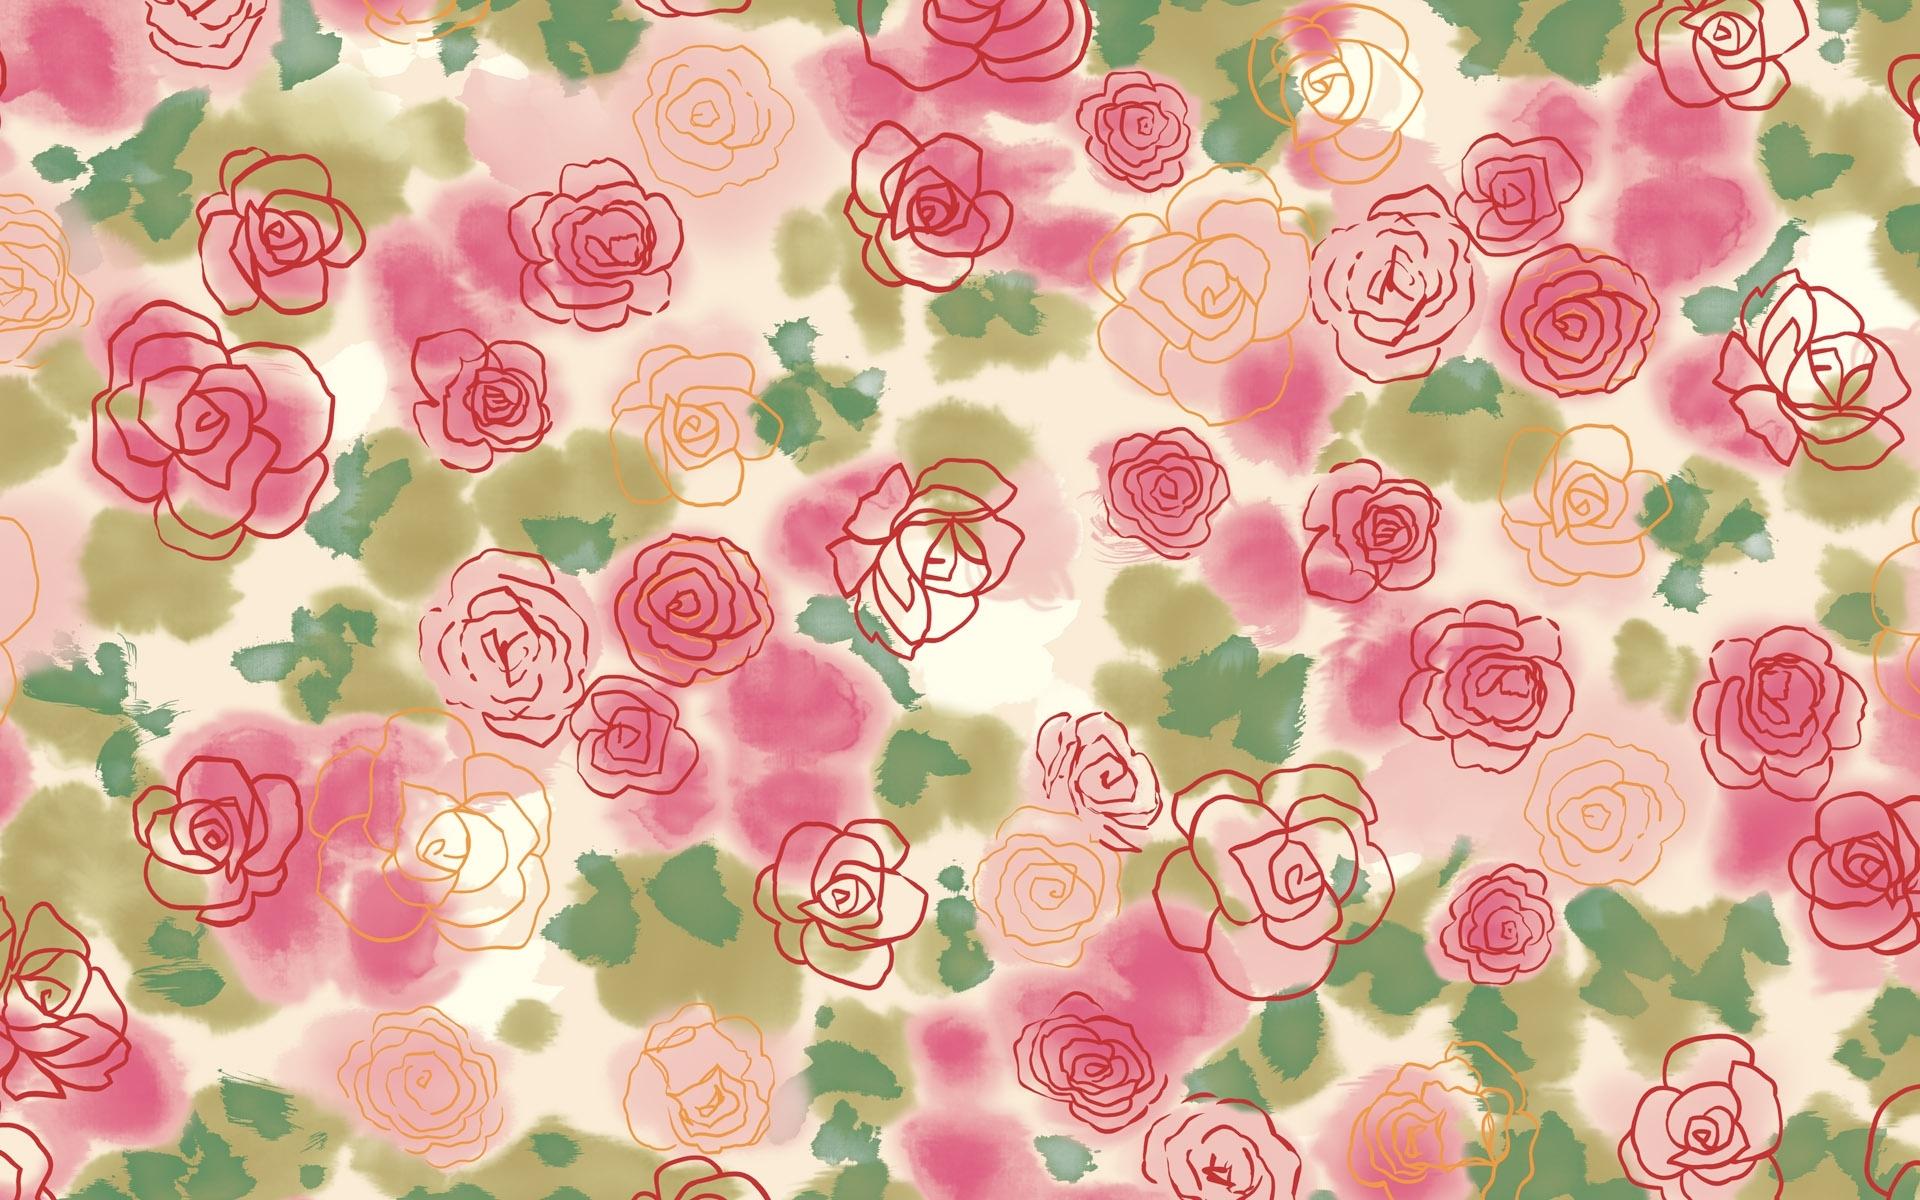 flower pattern background wallpaper | hd desktop background